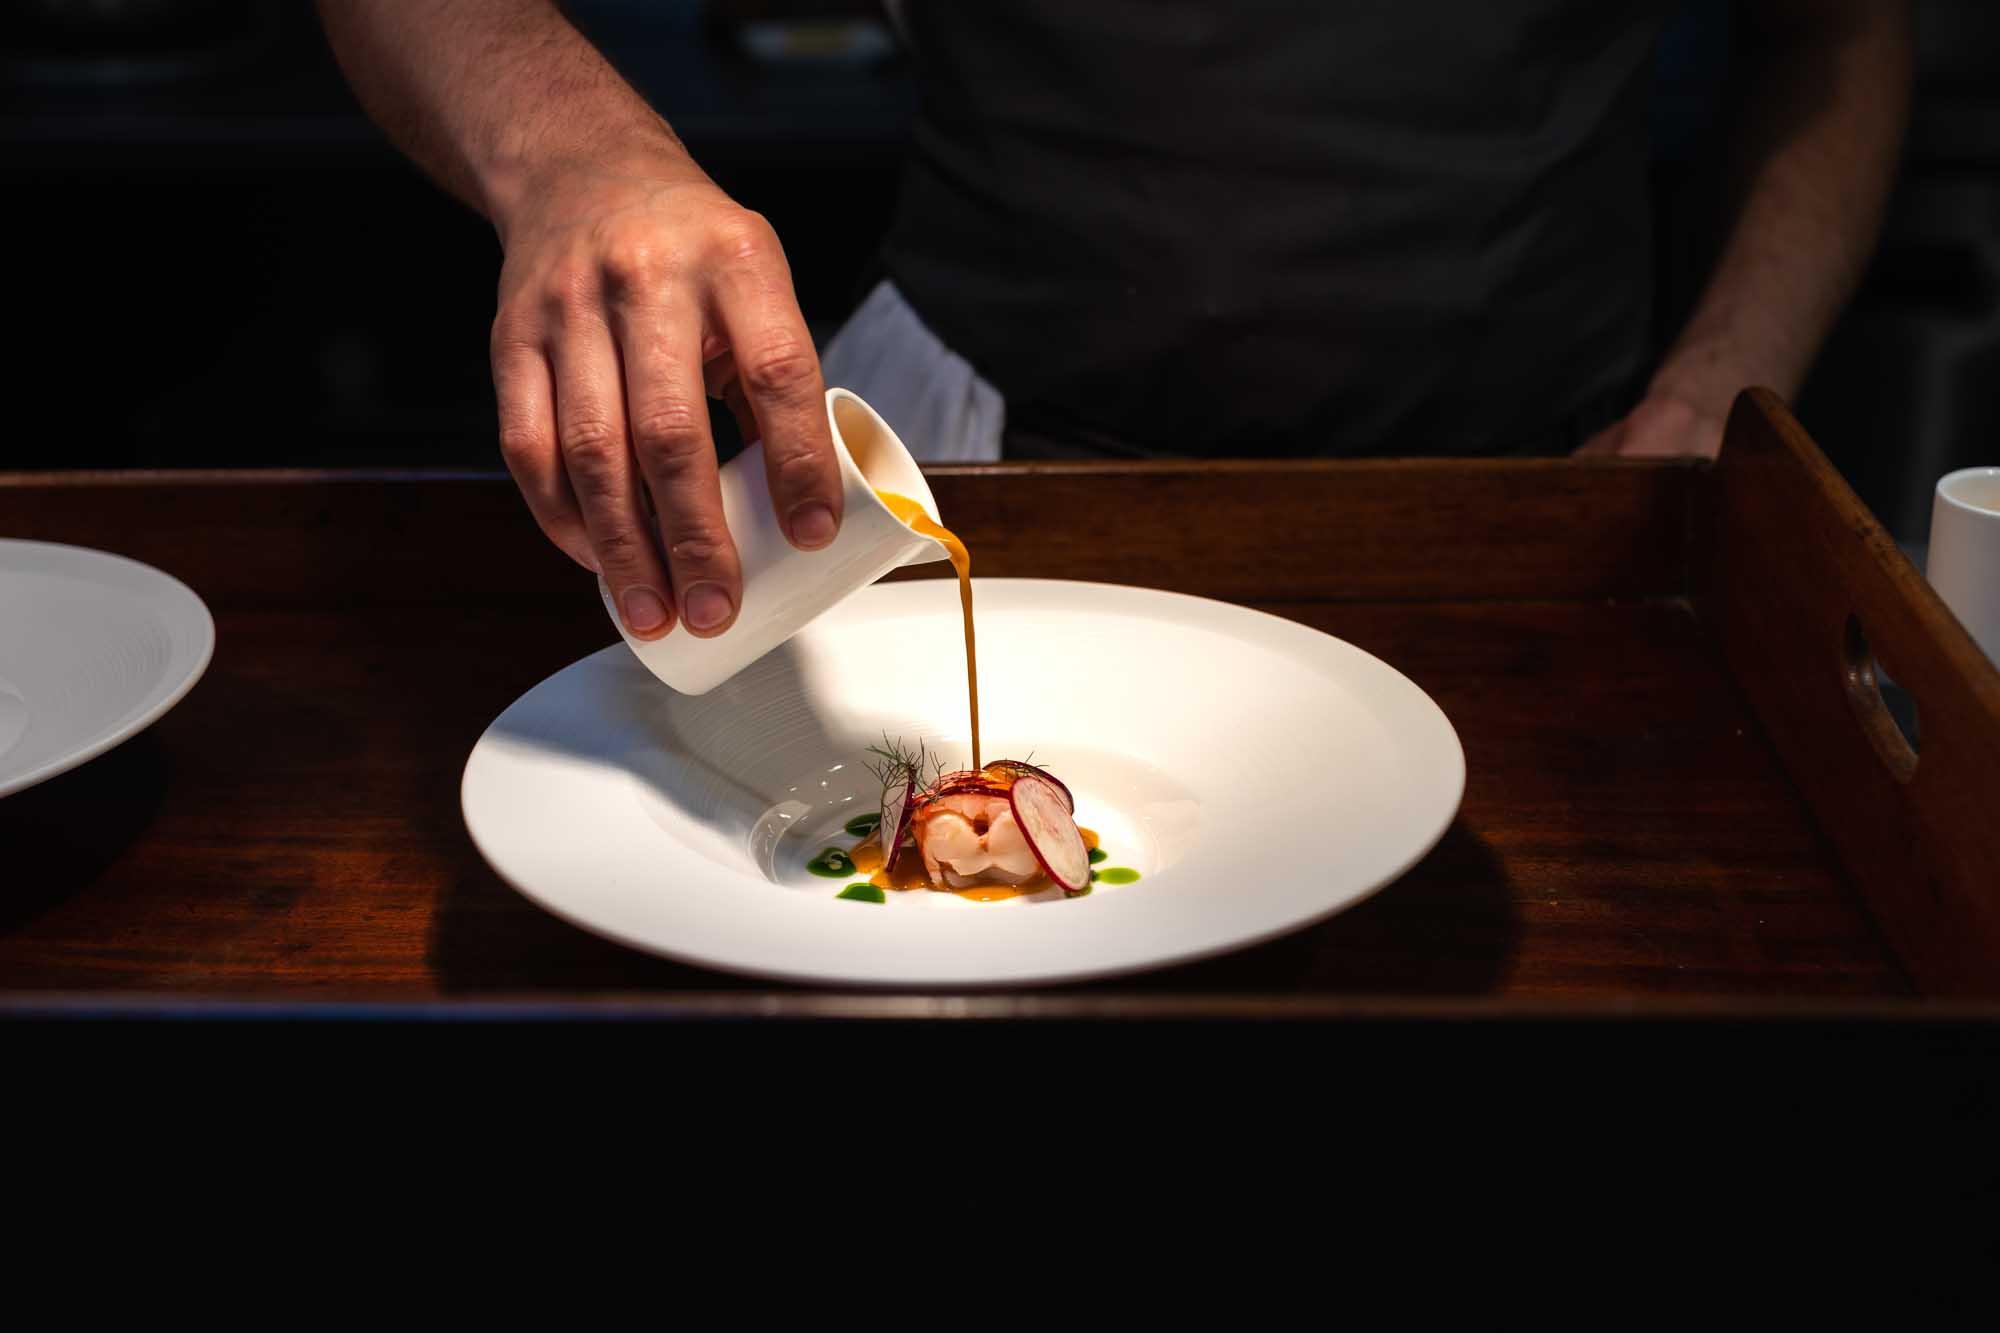 Lara Jane Thorpe-Lobster Catch restaurant- food photography Dorset